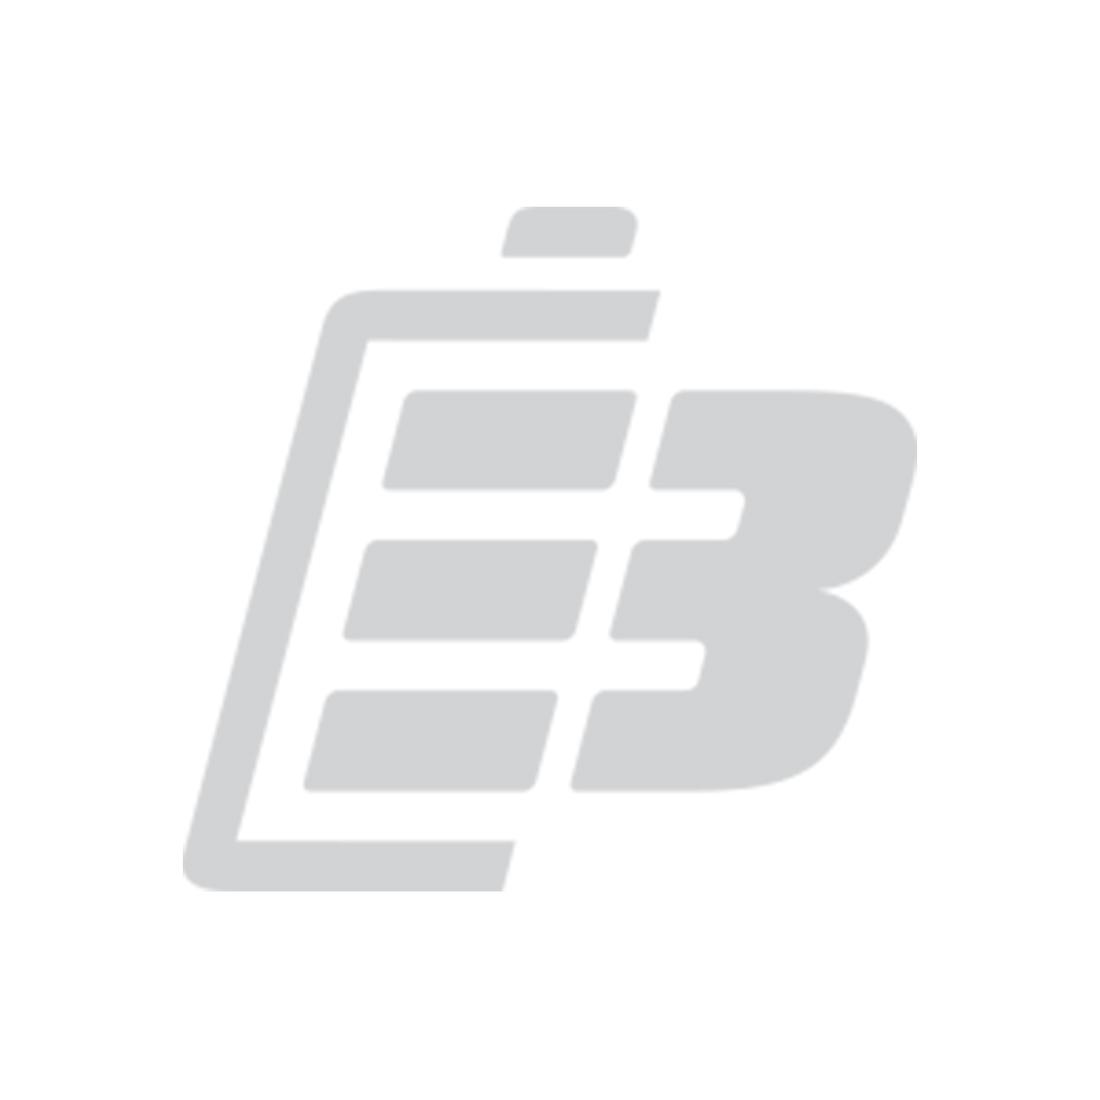 Smartphone battery Motorola Flipout MB511_1